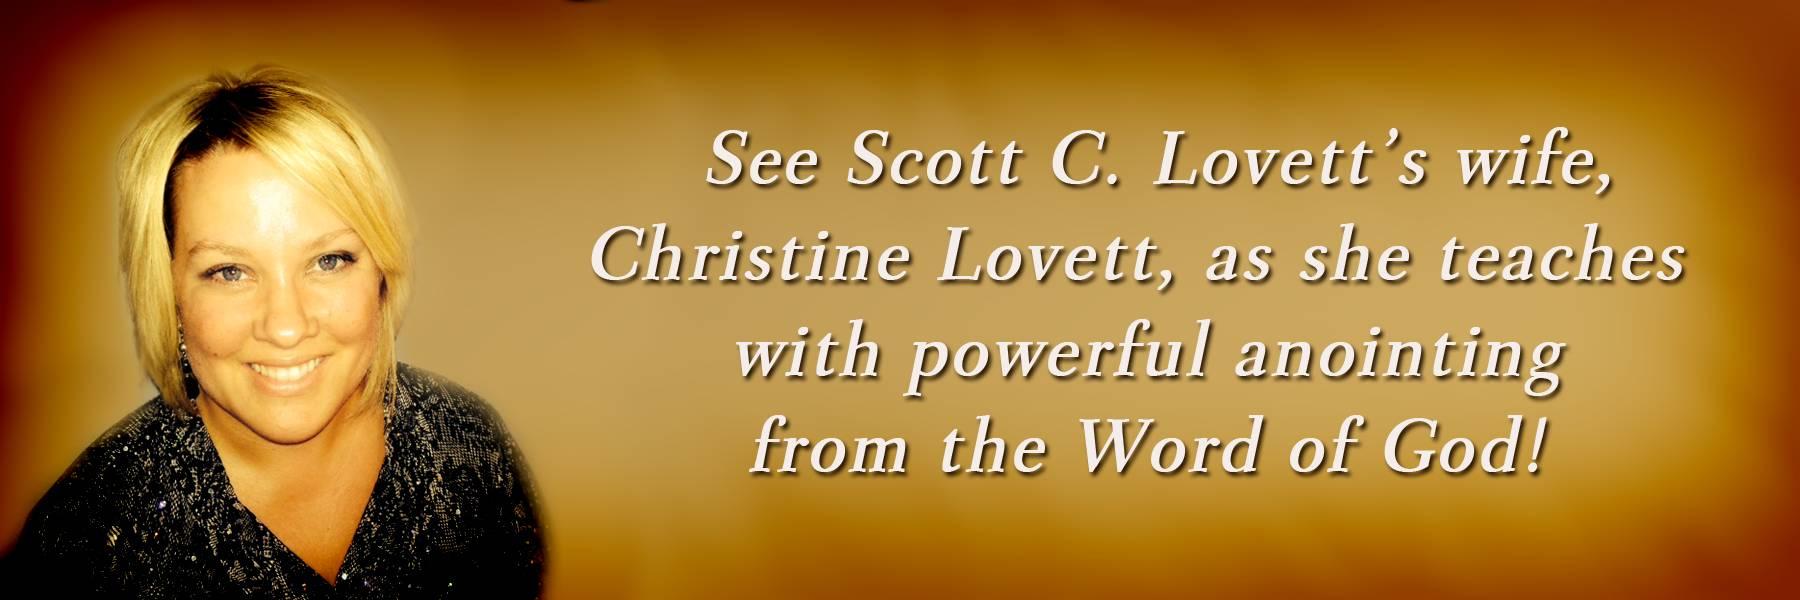 Christine Lovett